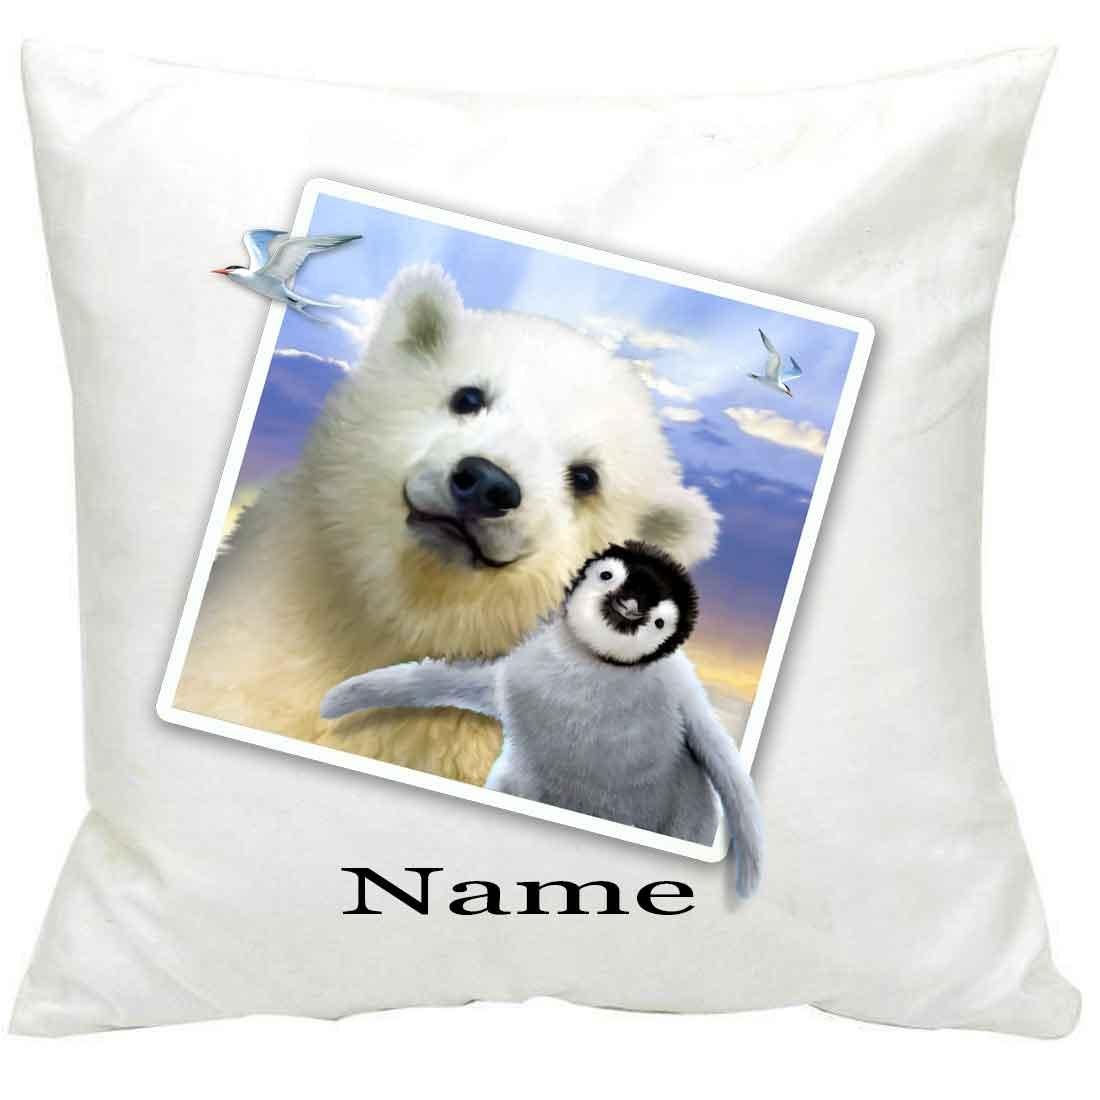 PersonalisedPolar Pals Selfie Printed Cushion